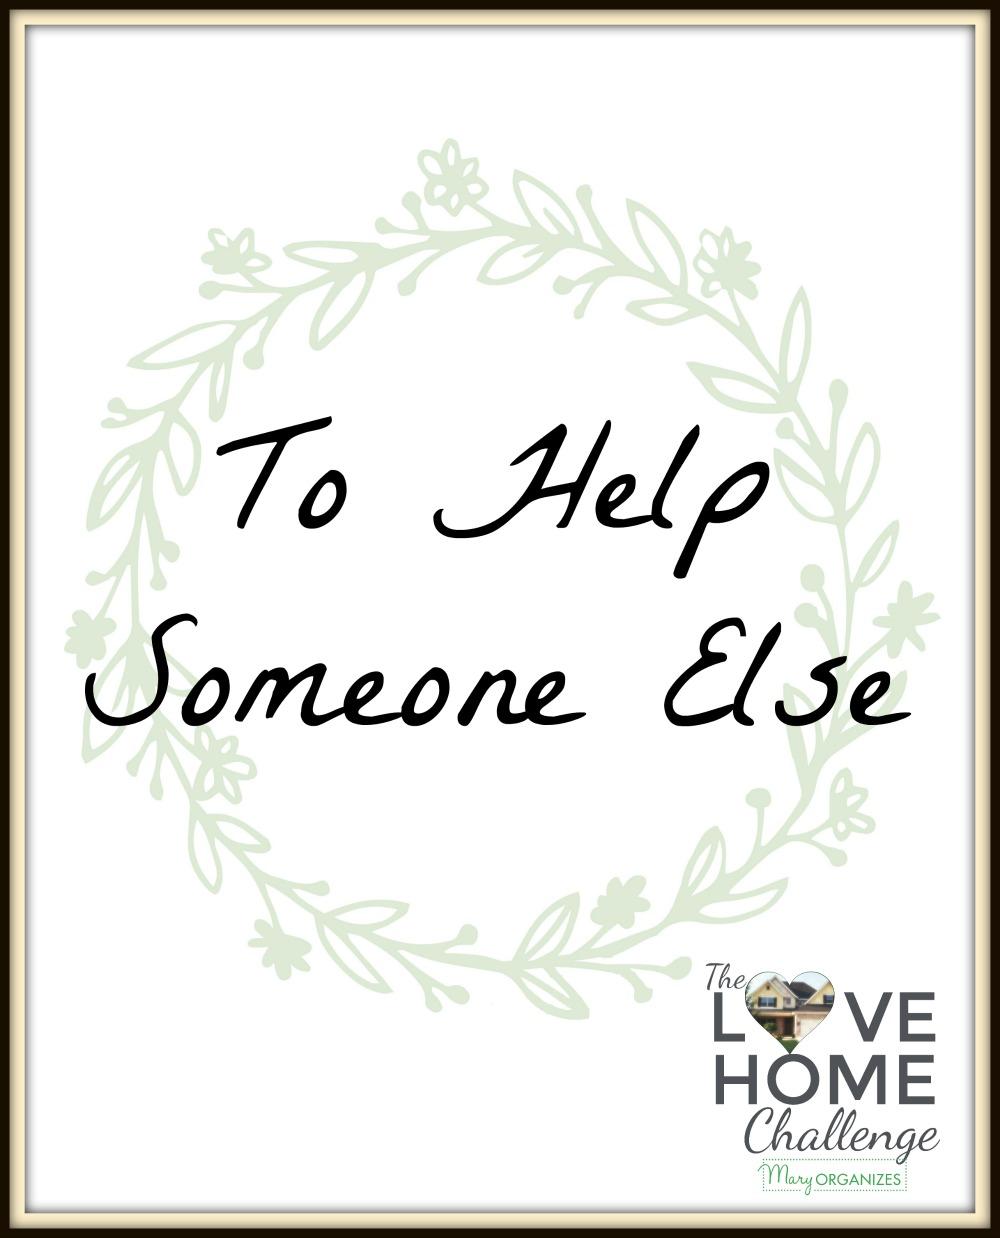 love-home-challenge-to-help-someone-else-week-v